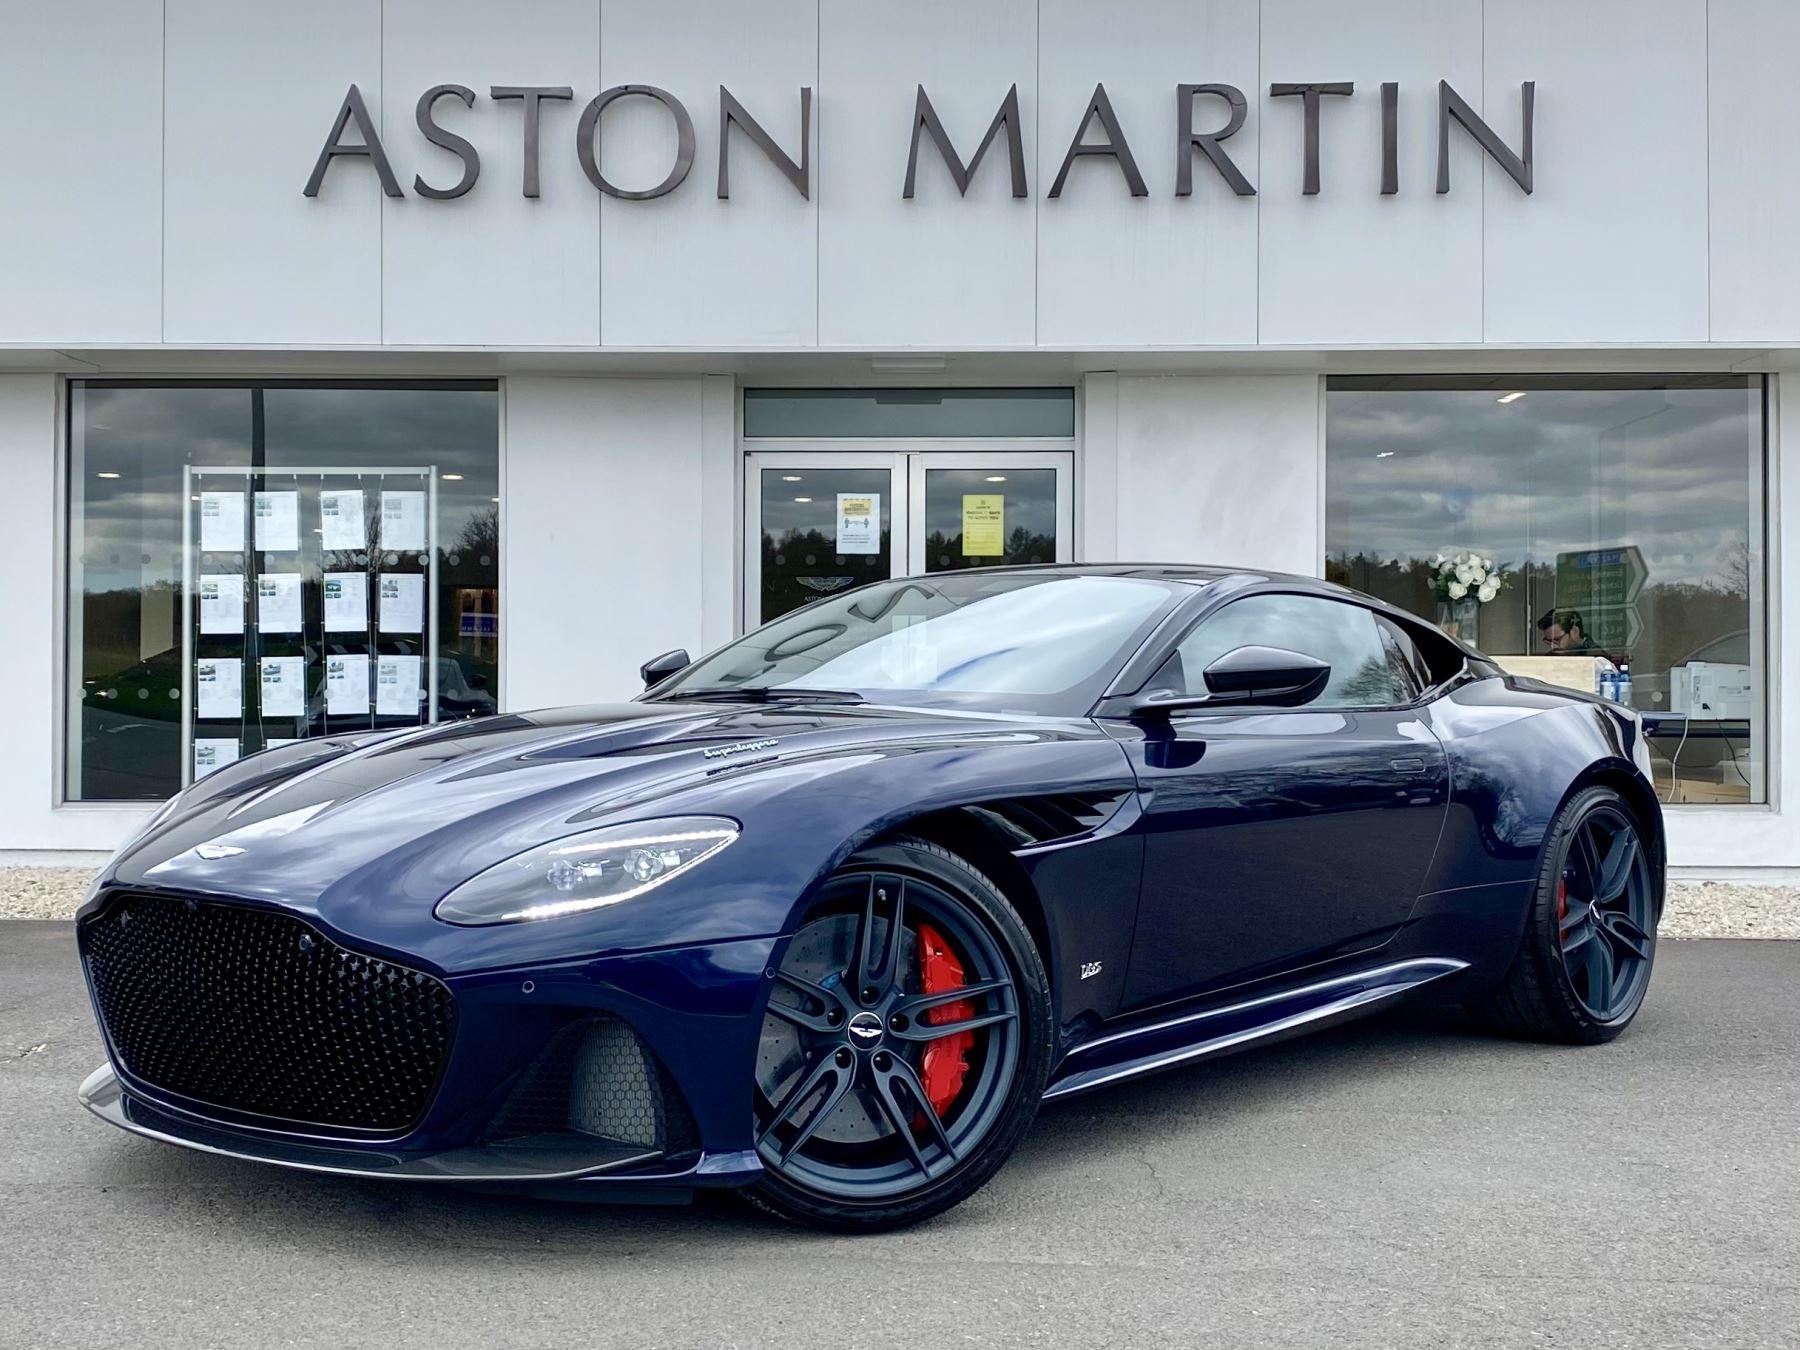 Aston Martin DBS Superleggera V12 Superleggera 2dr Touchtronic Auto 5.2 Automatic 3 door Coupe